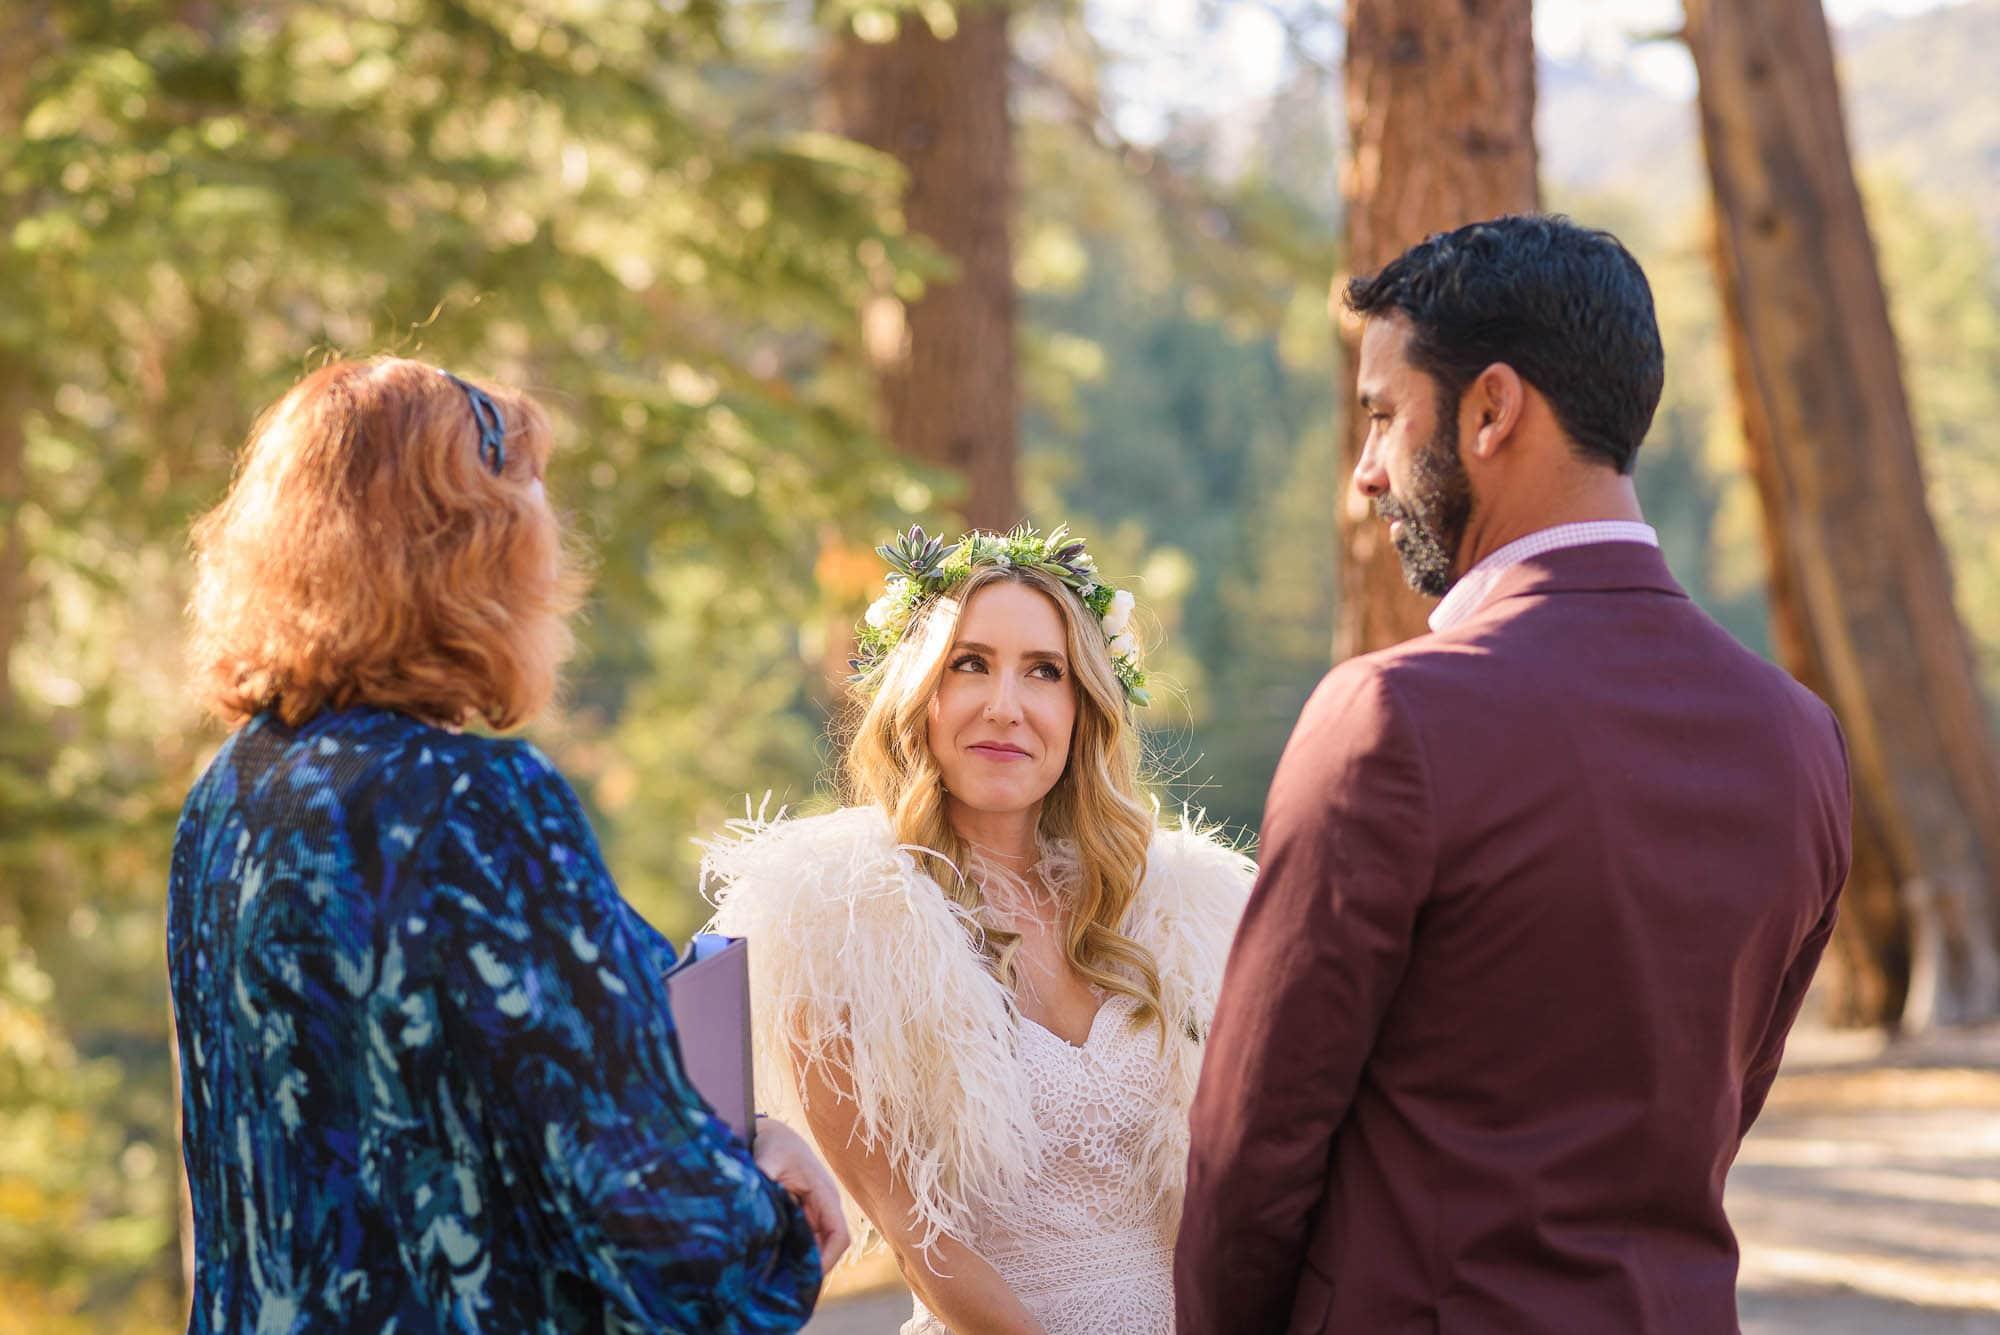 016_Alan_and_Heidi_Wedding_Natalie_Mike